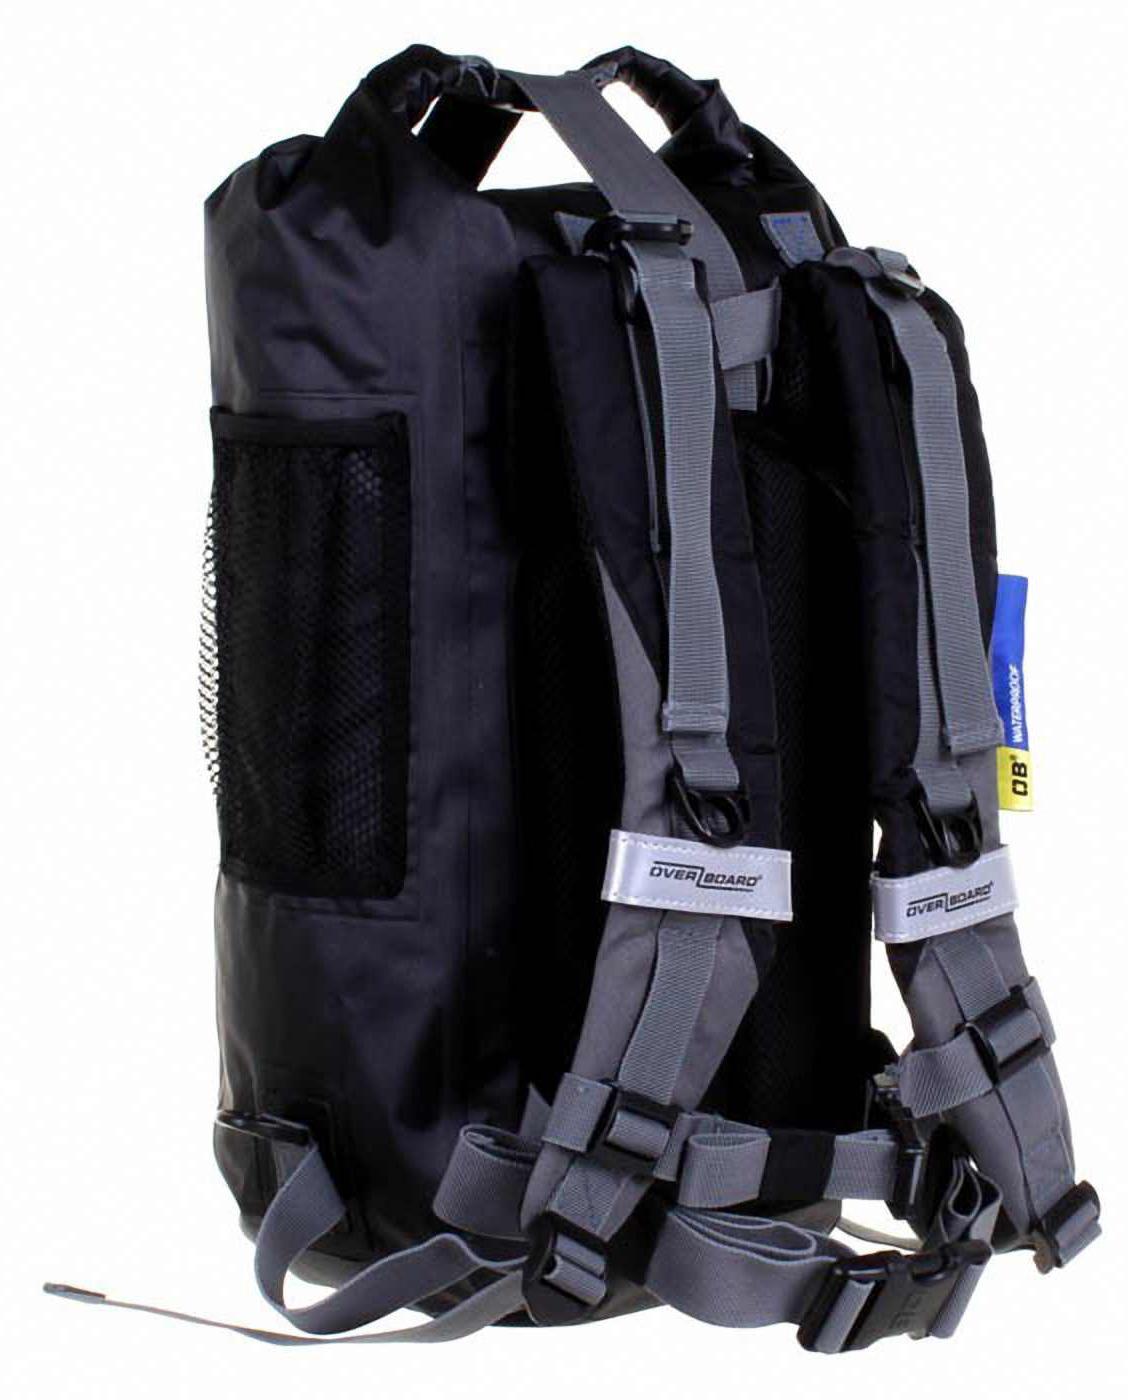 6642a17634 Overboard Ultra Light Pro Sports Waterproof Backpack- Fenix Toulouse ...